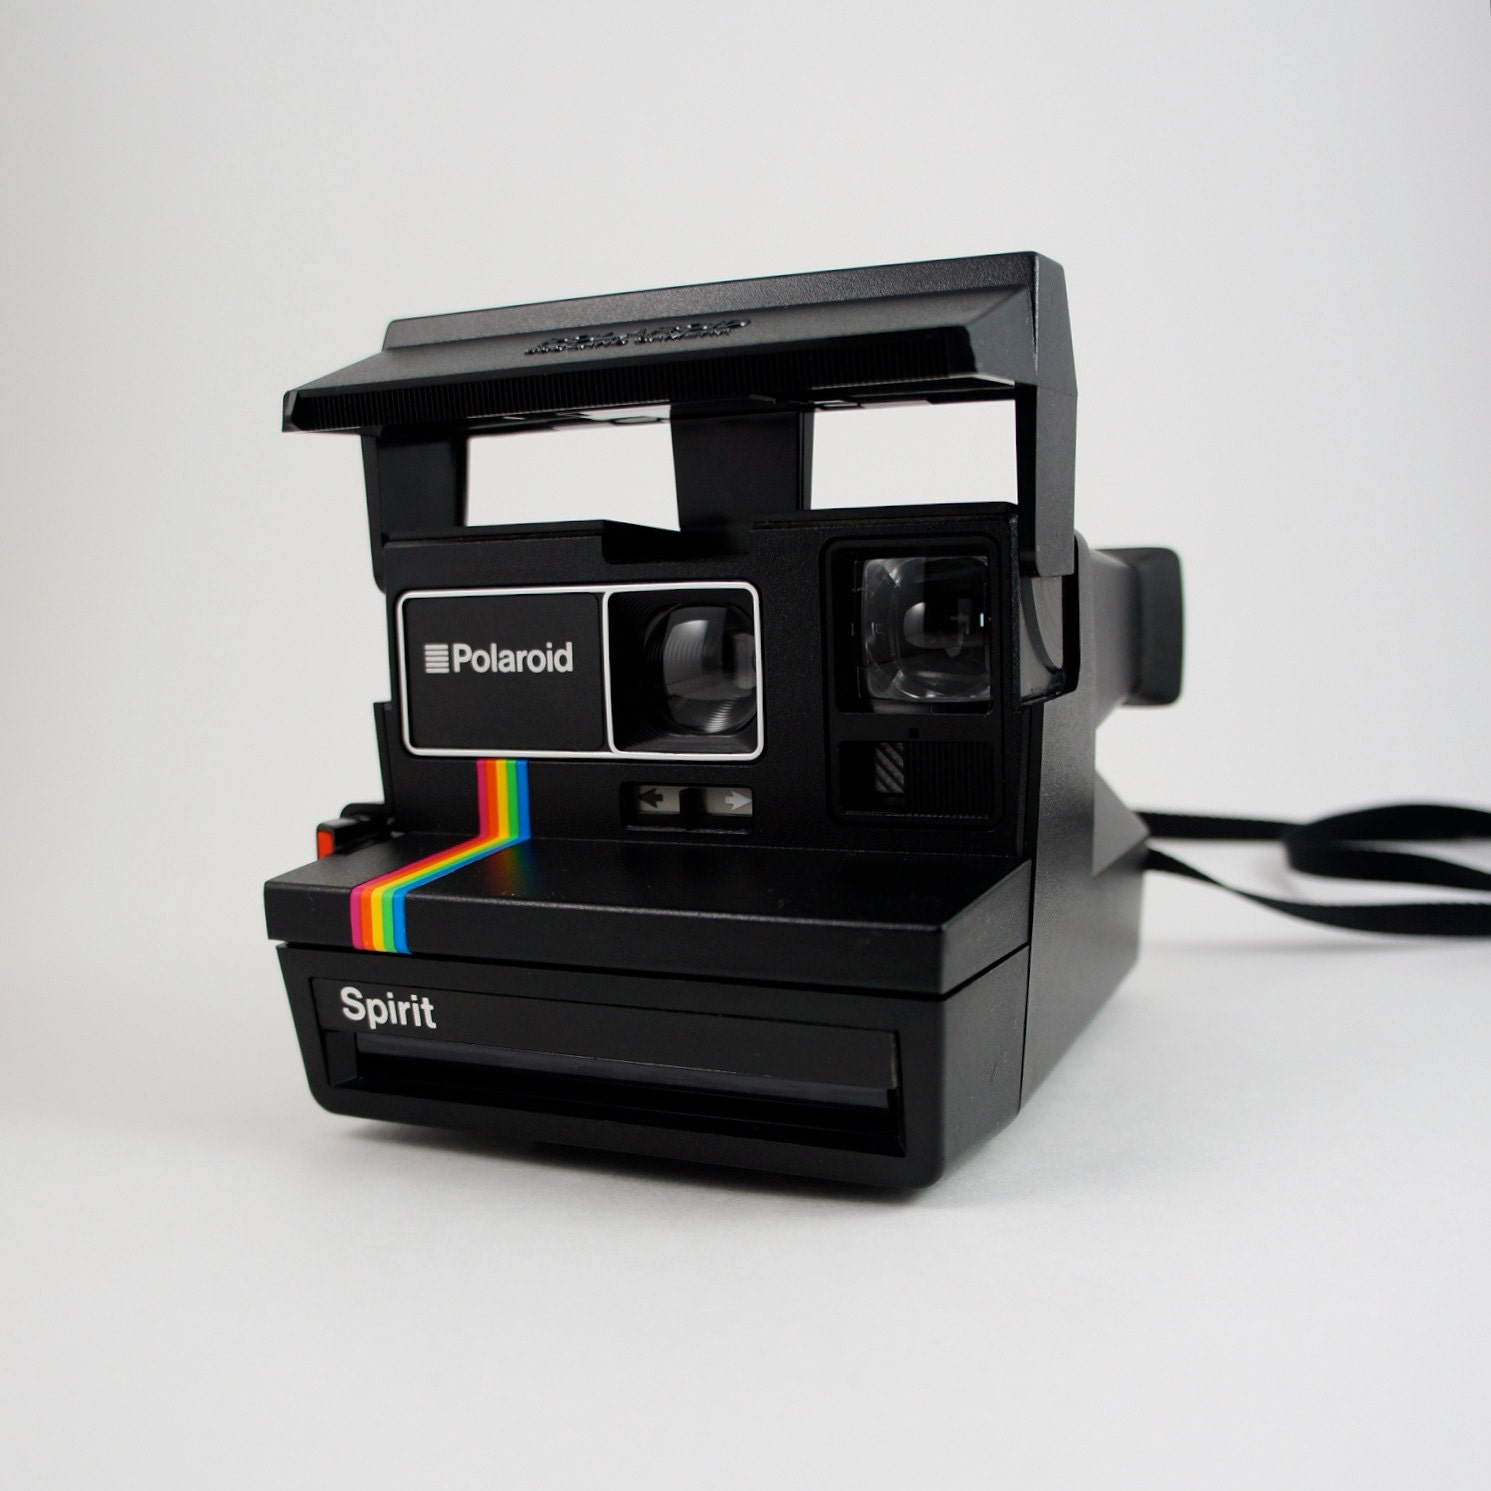 polaroid spirit 600 land camera. Black Bedroom Furniture Sets. Home Design Ideas